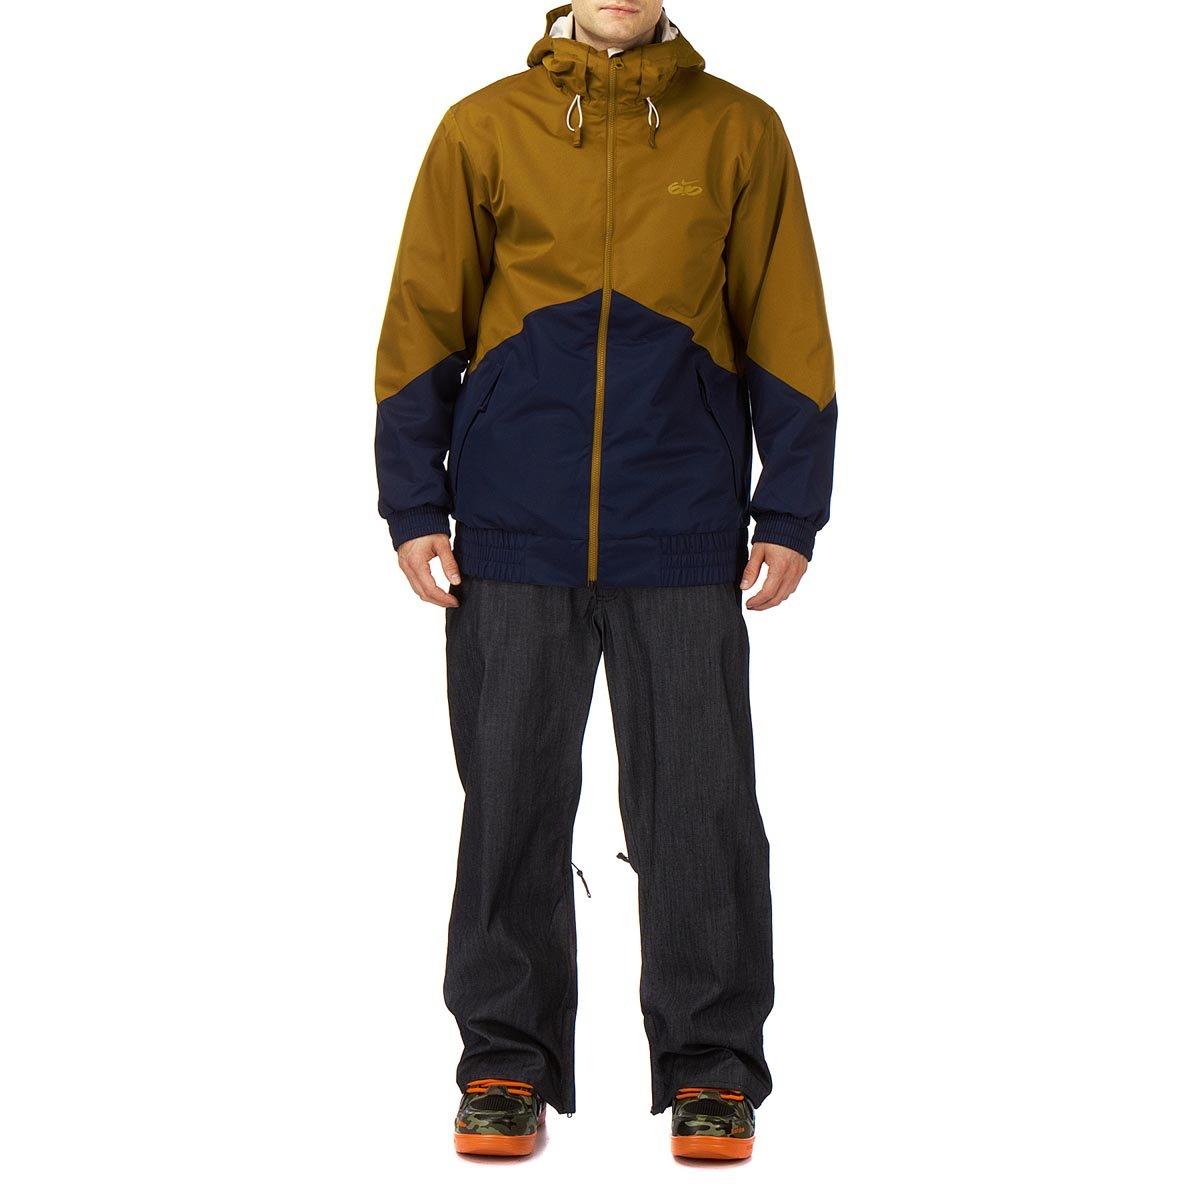 Nike 6.0 Kampai Snowboard Jacke Golden Hops: